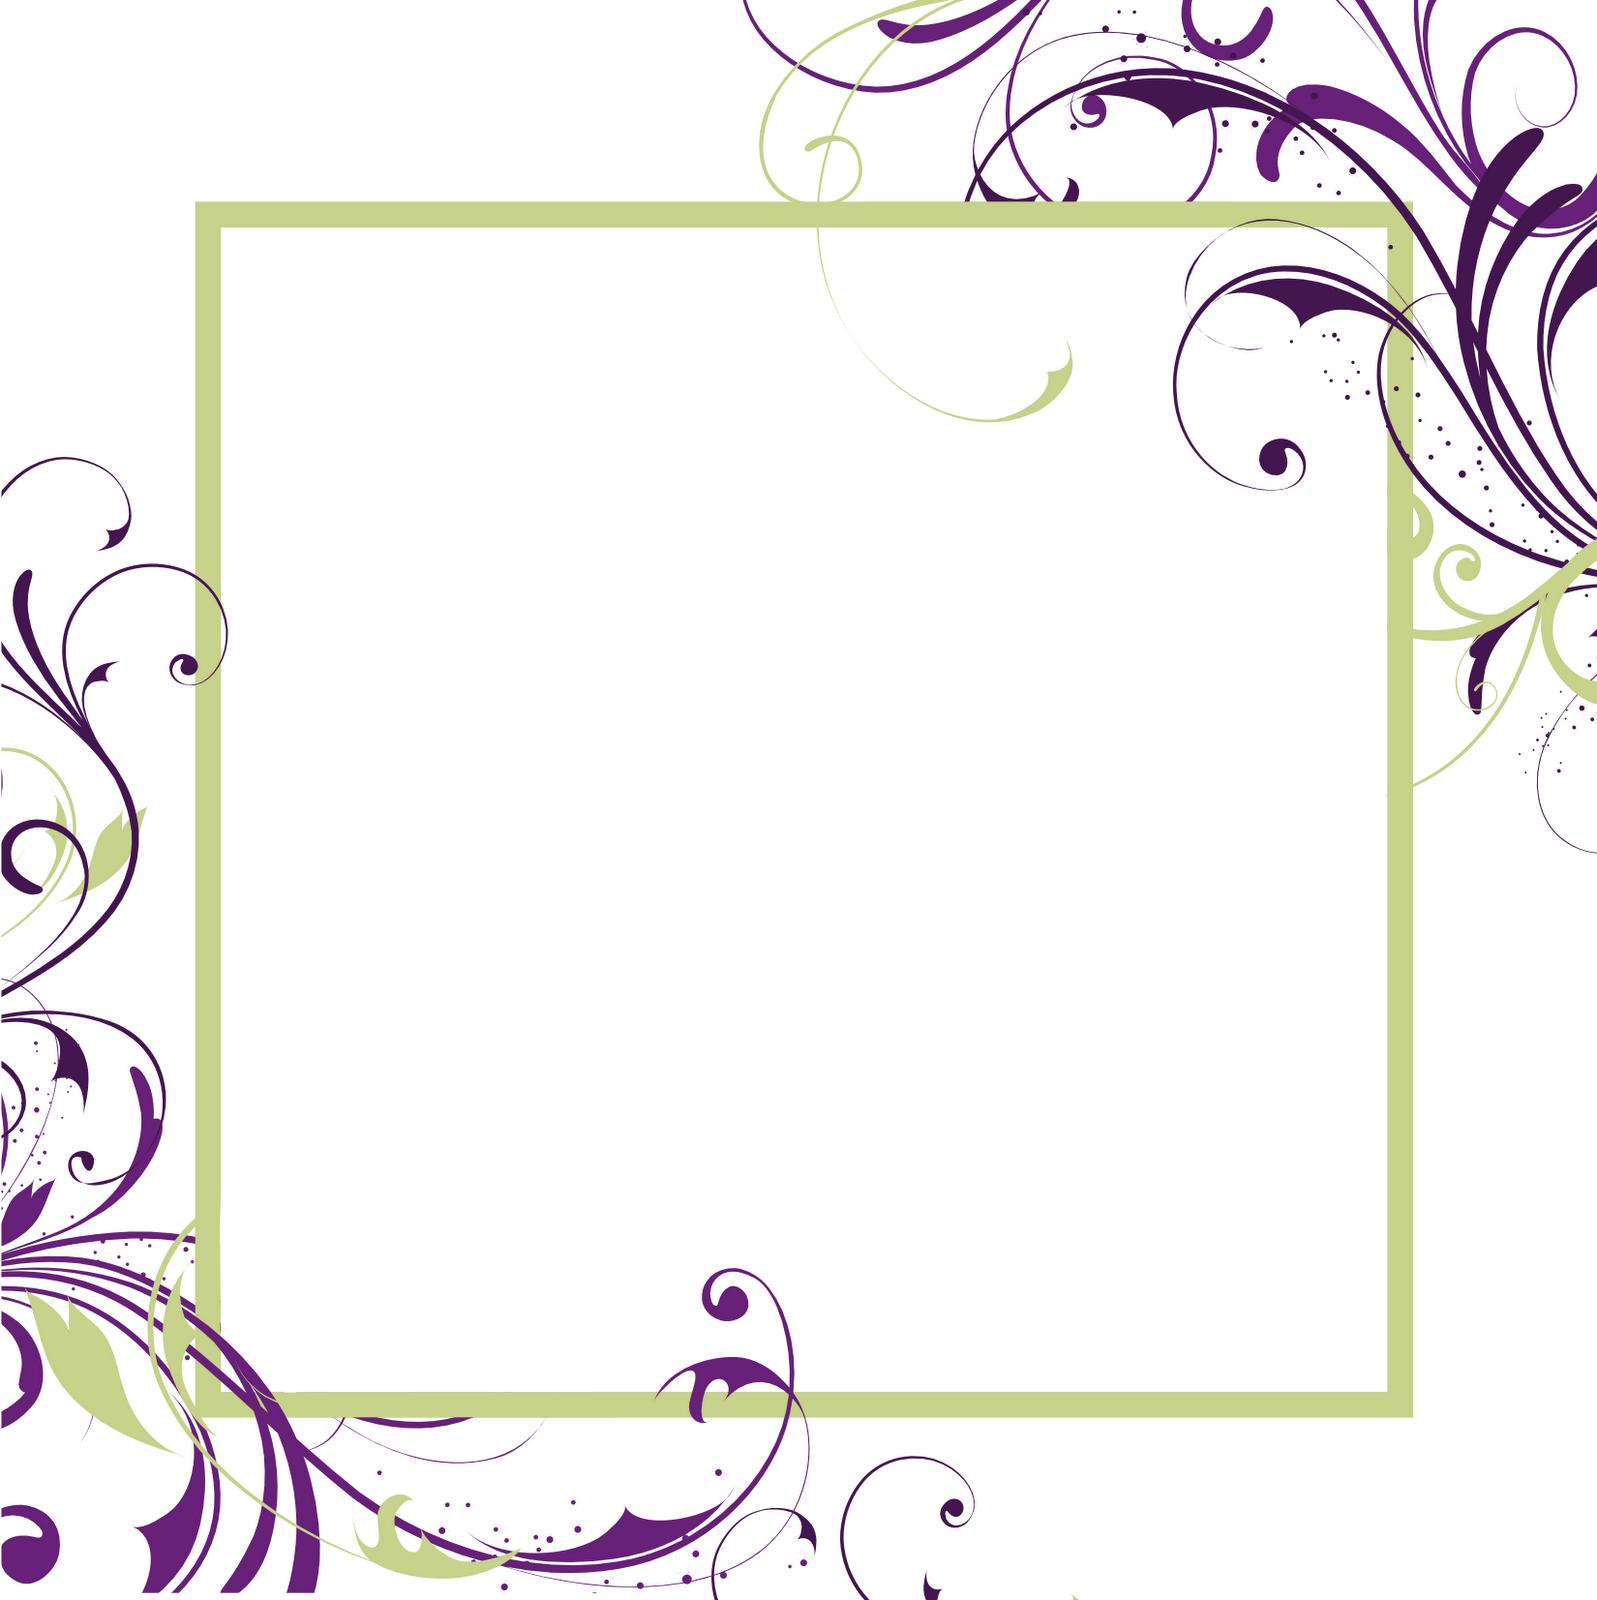 Free Printable Blank Invitations Templates  Wedding Invite Template With Blank Templates For Invitations